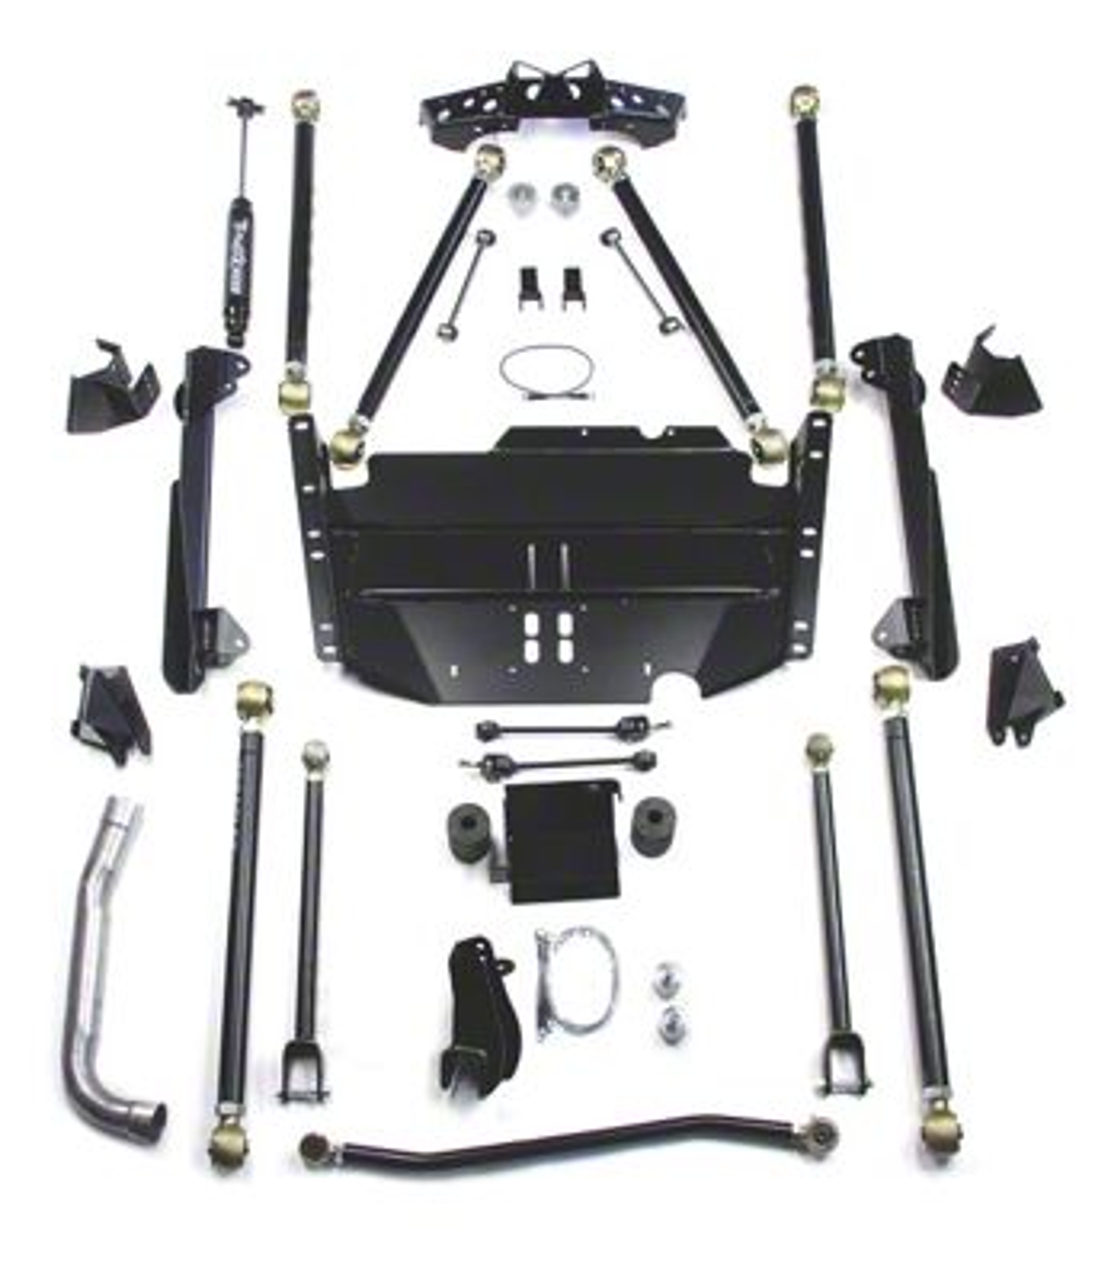 Teraflex Pro LCG Suspension Lift Kit for Coilovers (97-06 Jeep Wrangler TJ)